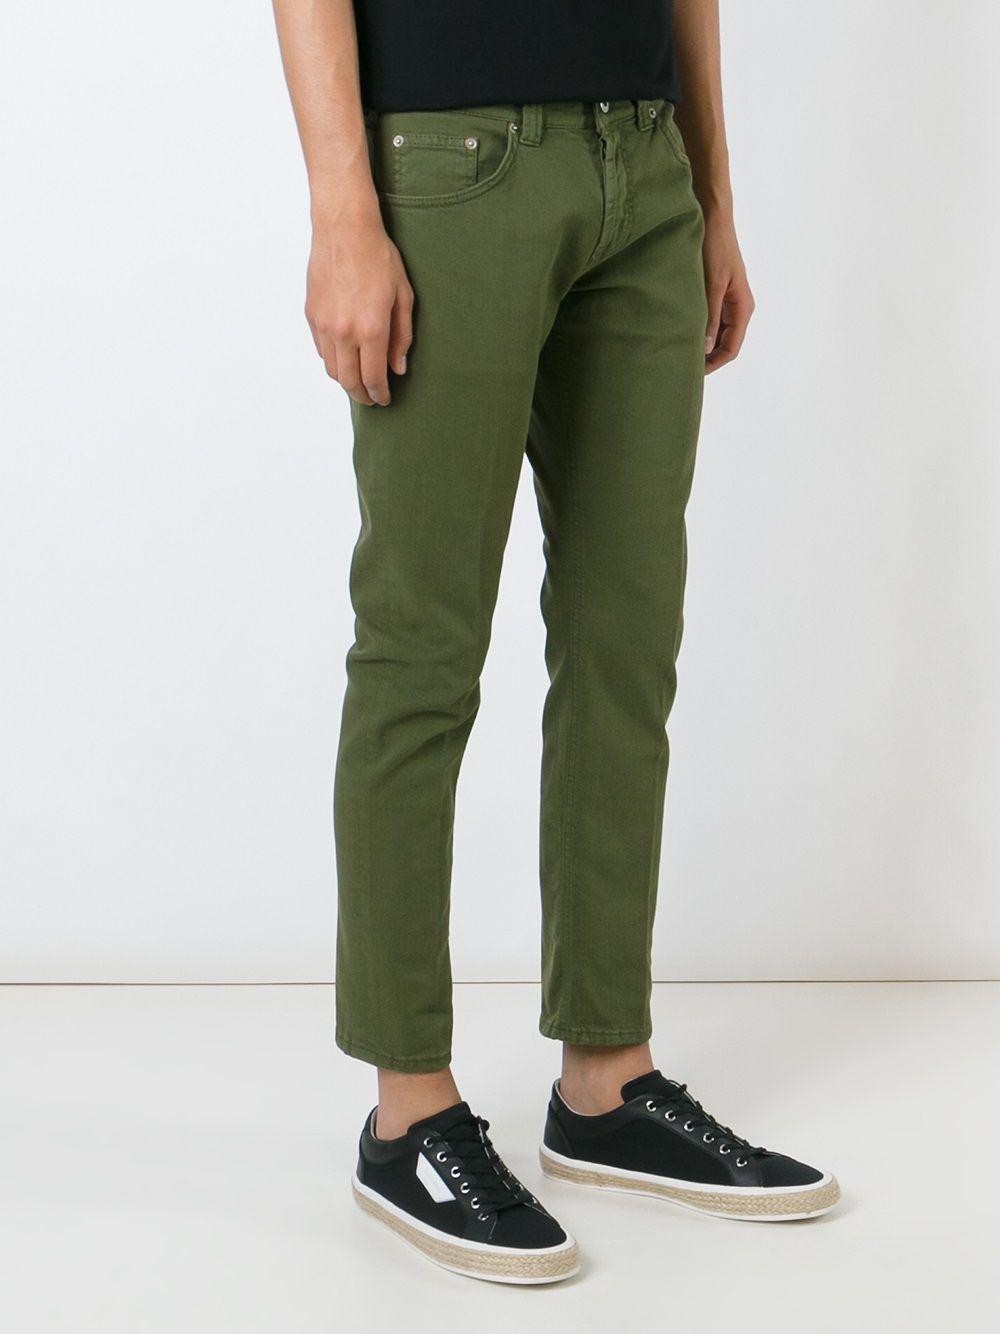 Dondup Denim Classic Slim Jeans in Green for Men